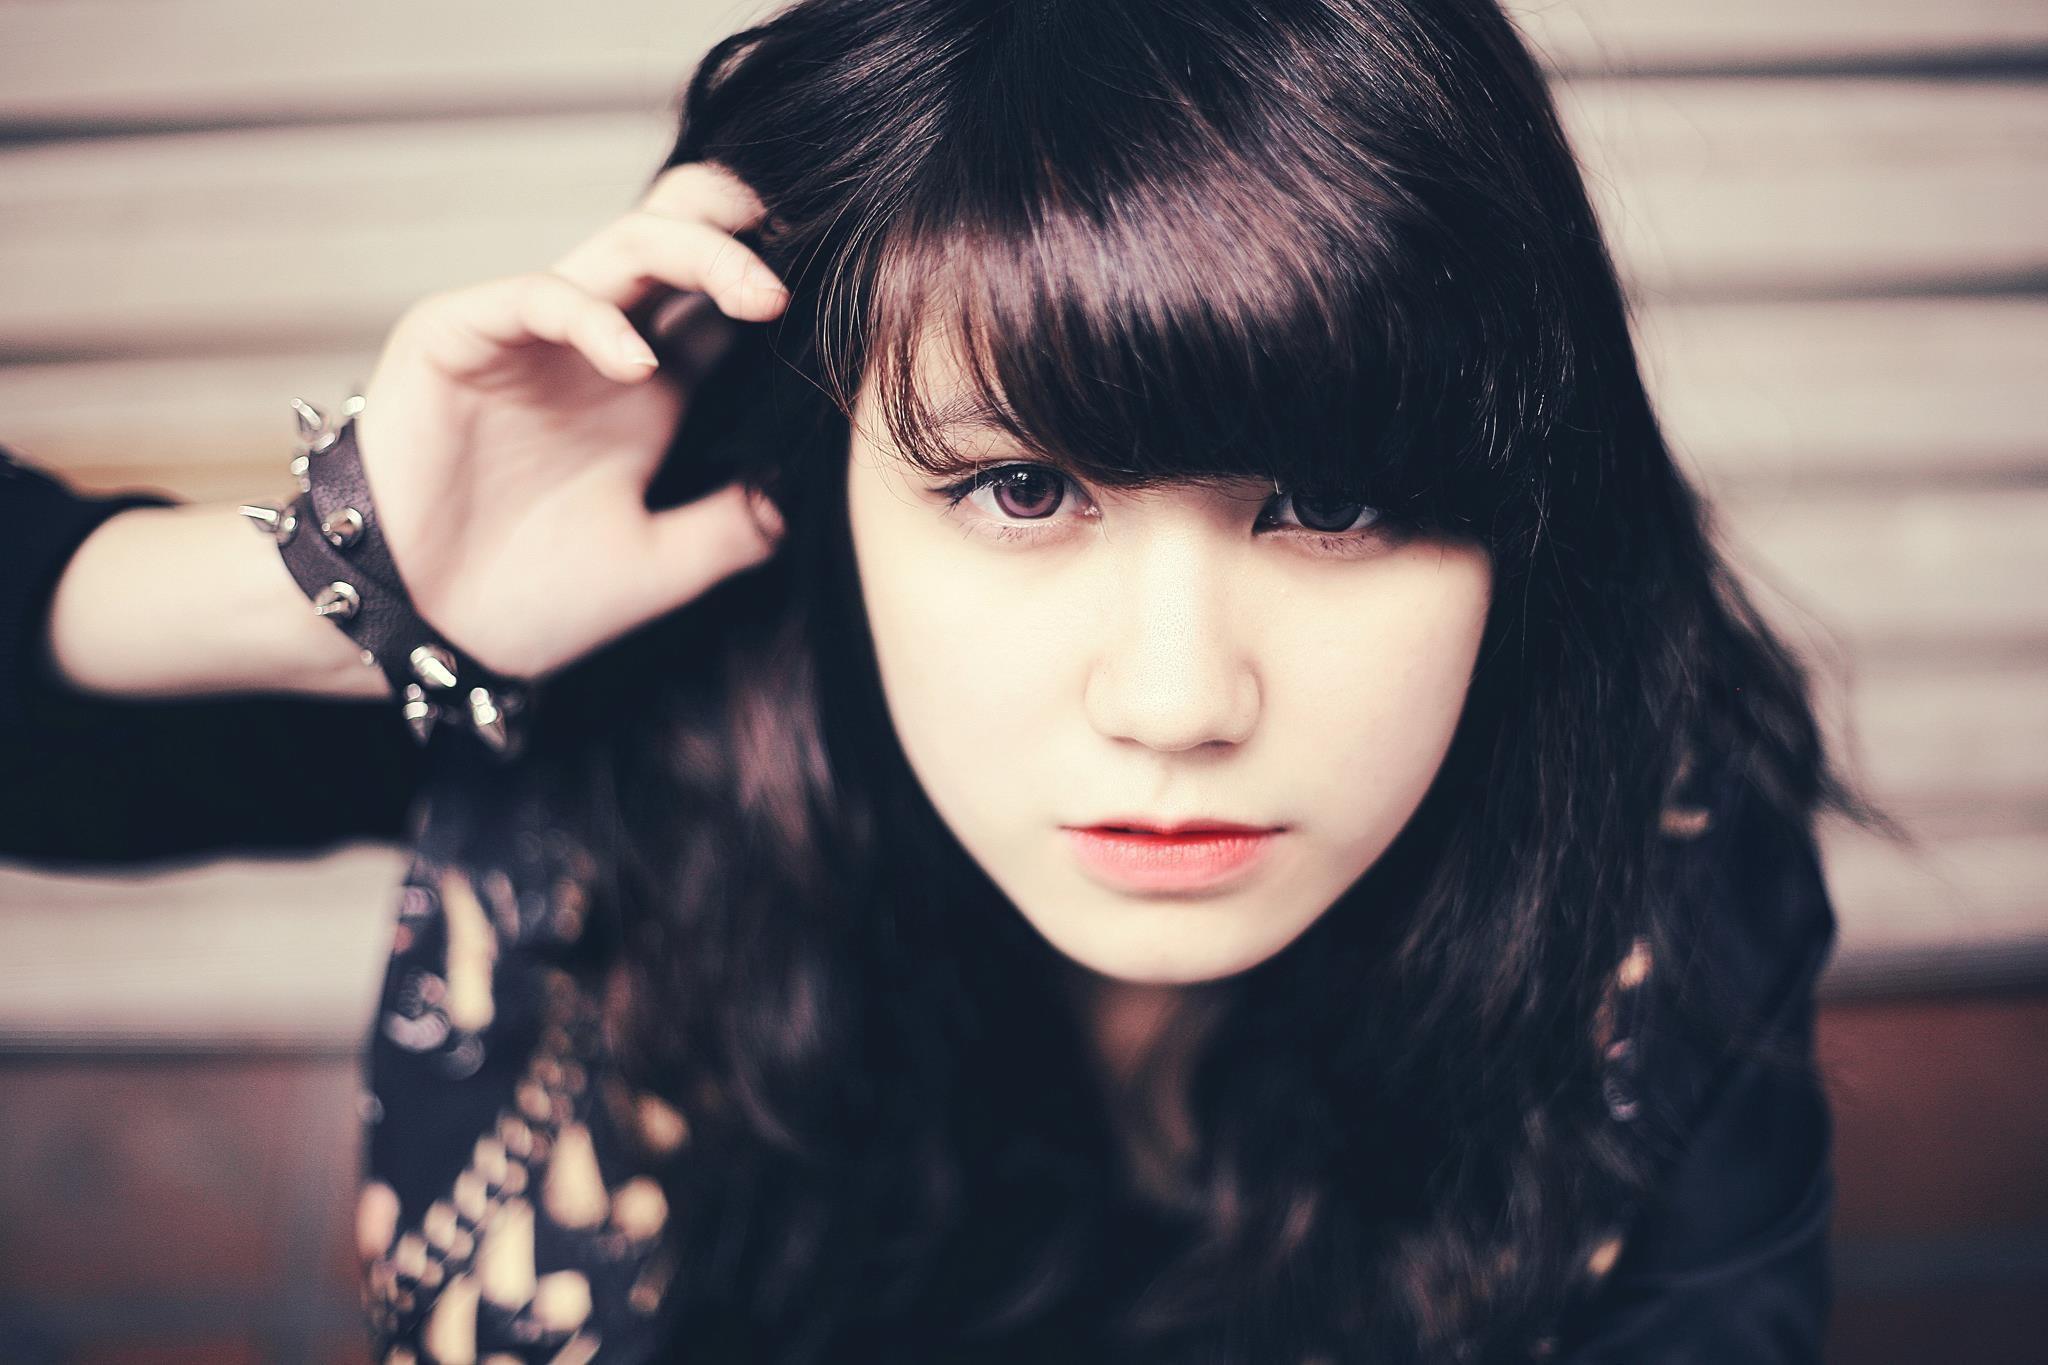 Download Ann Japan Cool Girl Wallpaper   Free Wallpapers